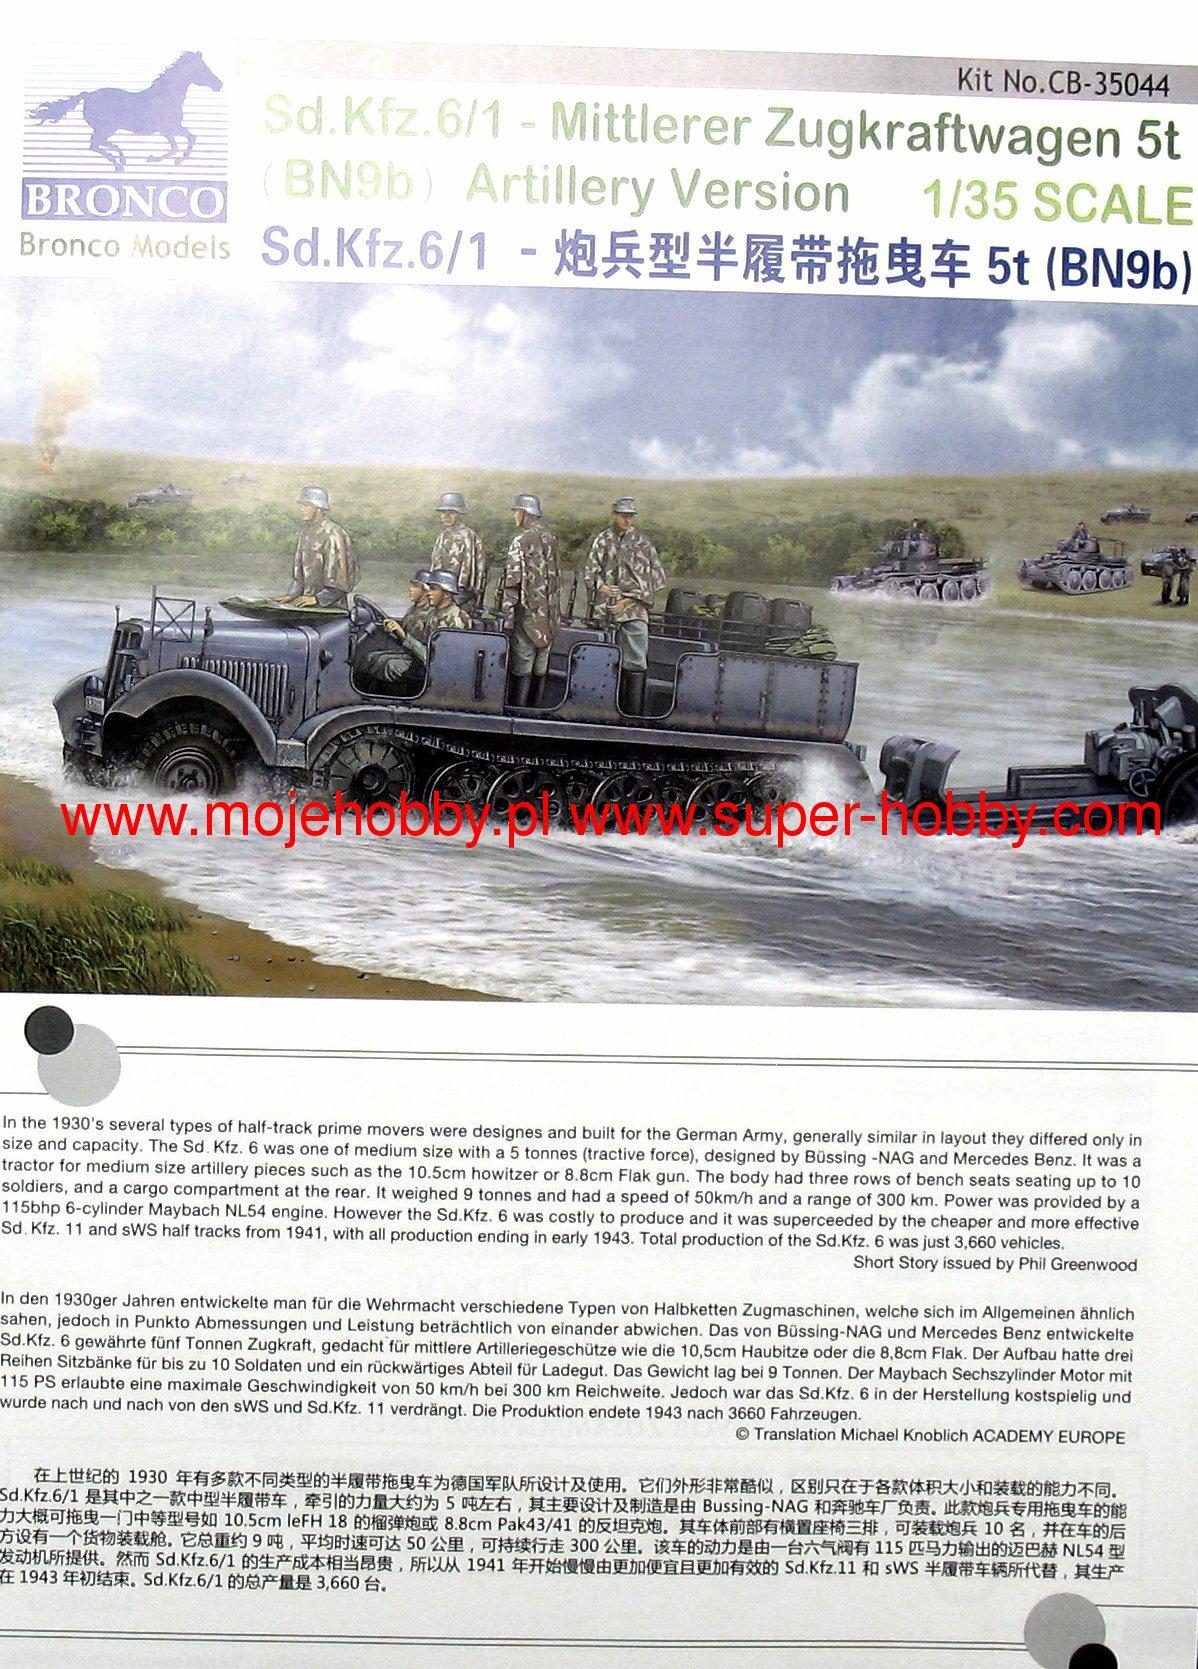 Bronco CB35044 Sd.Kfz 6 5T Typ Bn9 Artillery V.